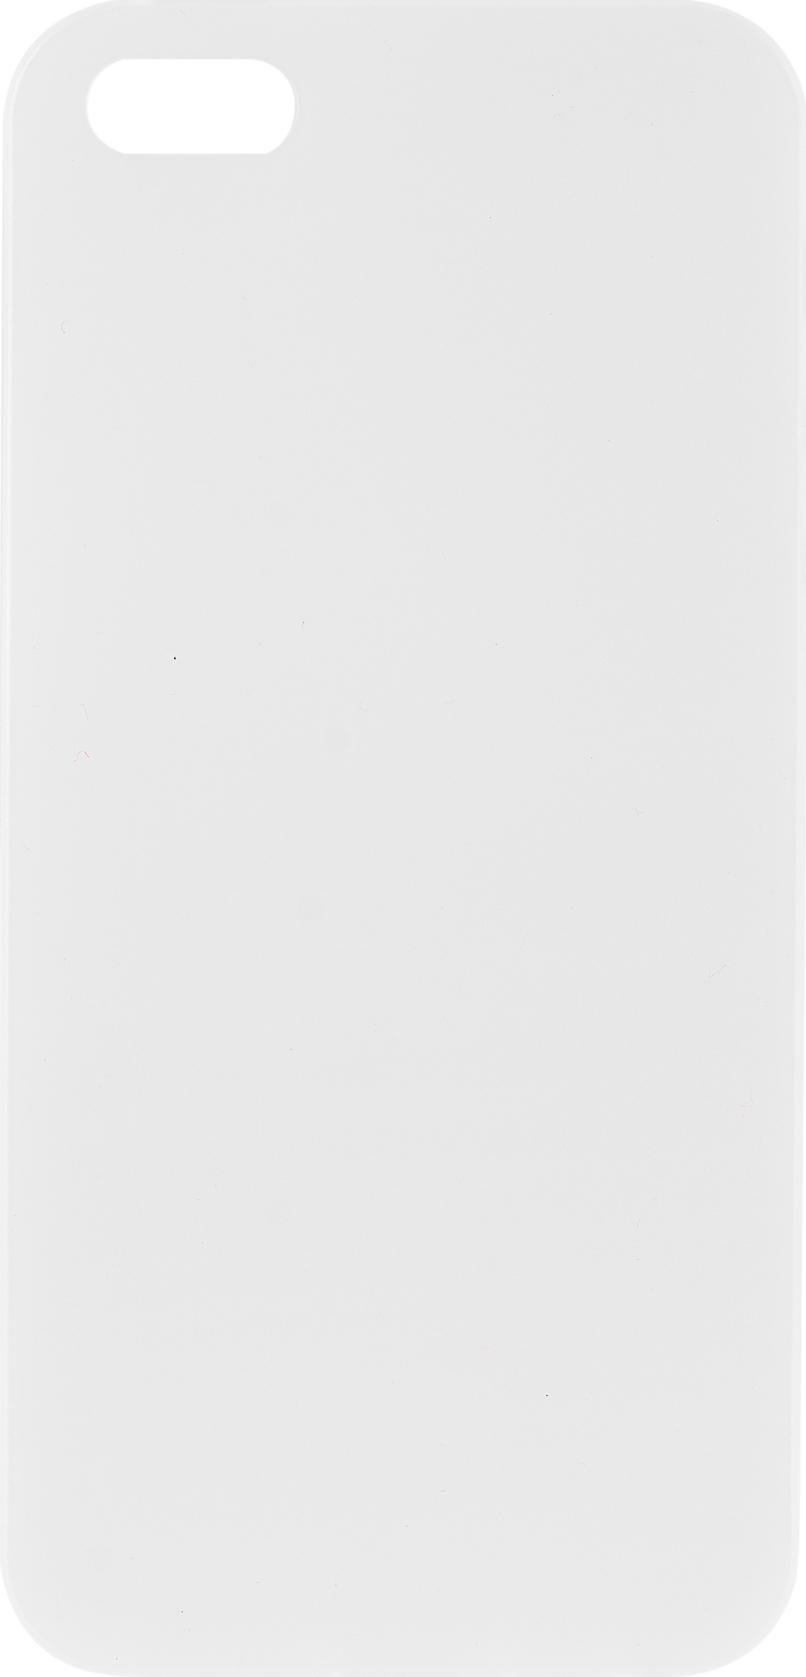 лучшая цена Чехол Brosco SuperSlim для Apple iPhone 5, белый